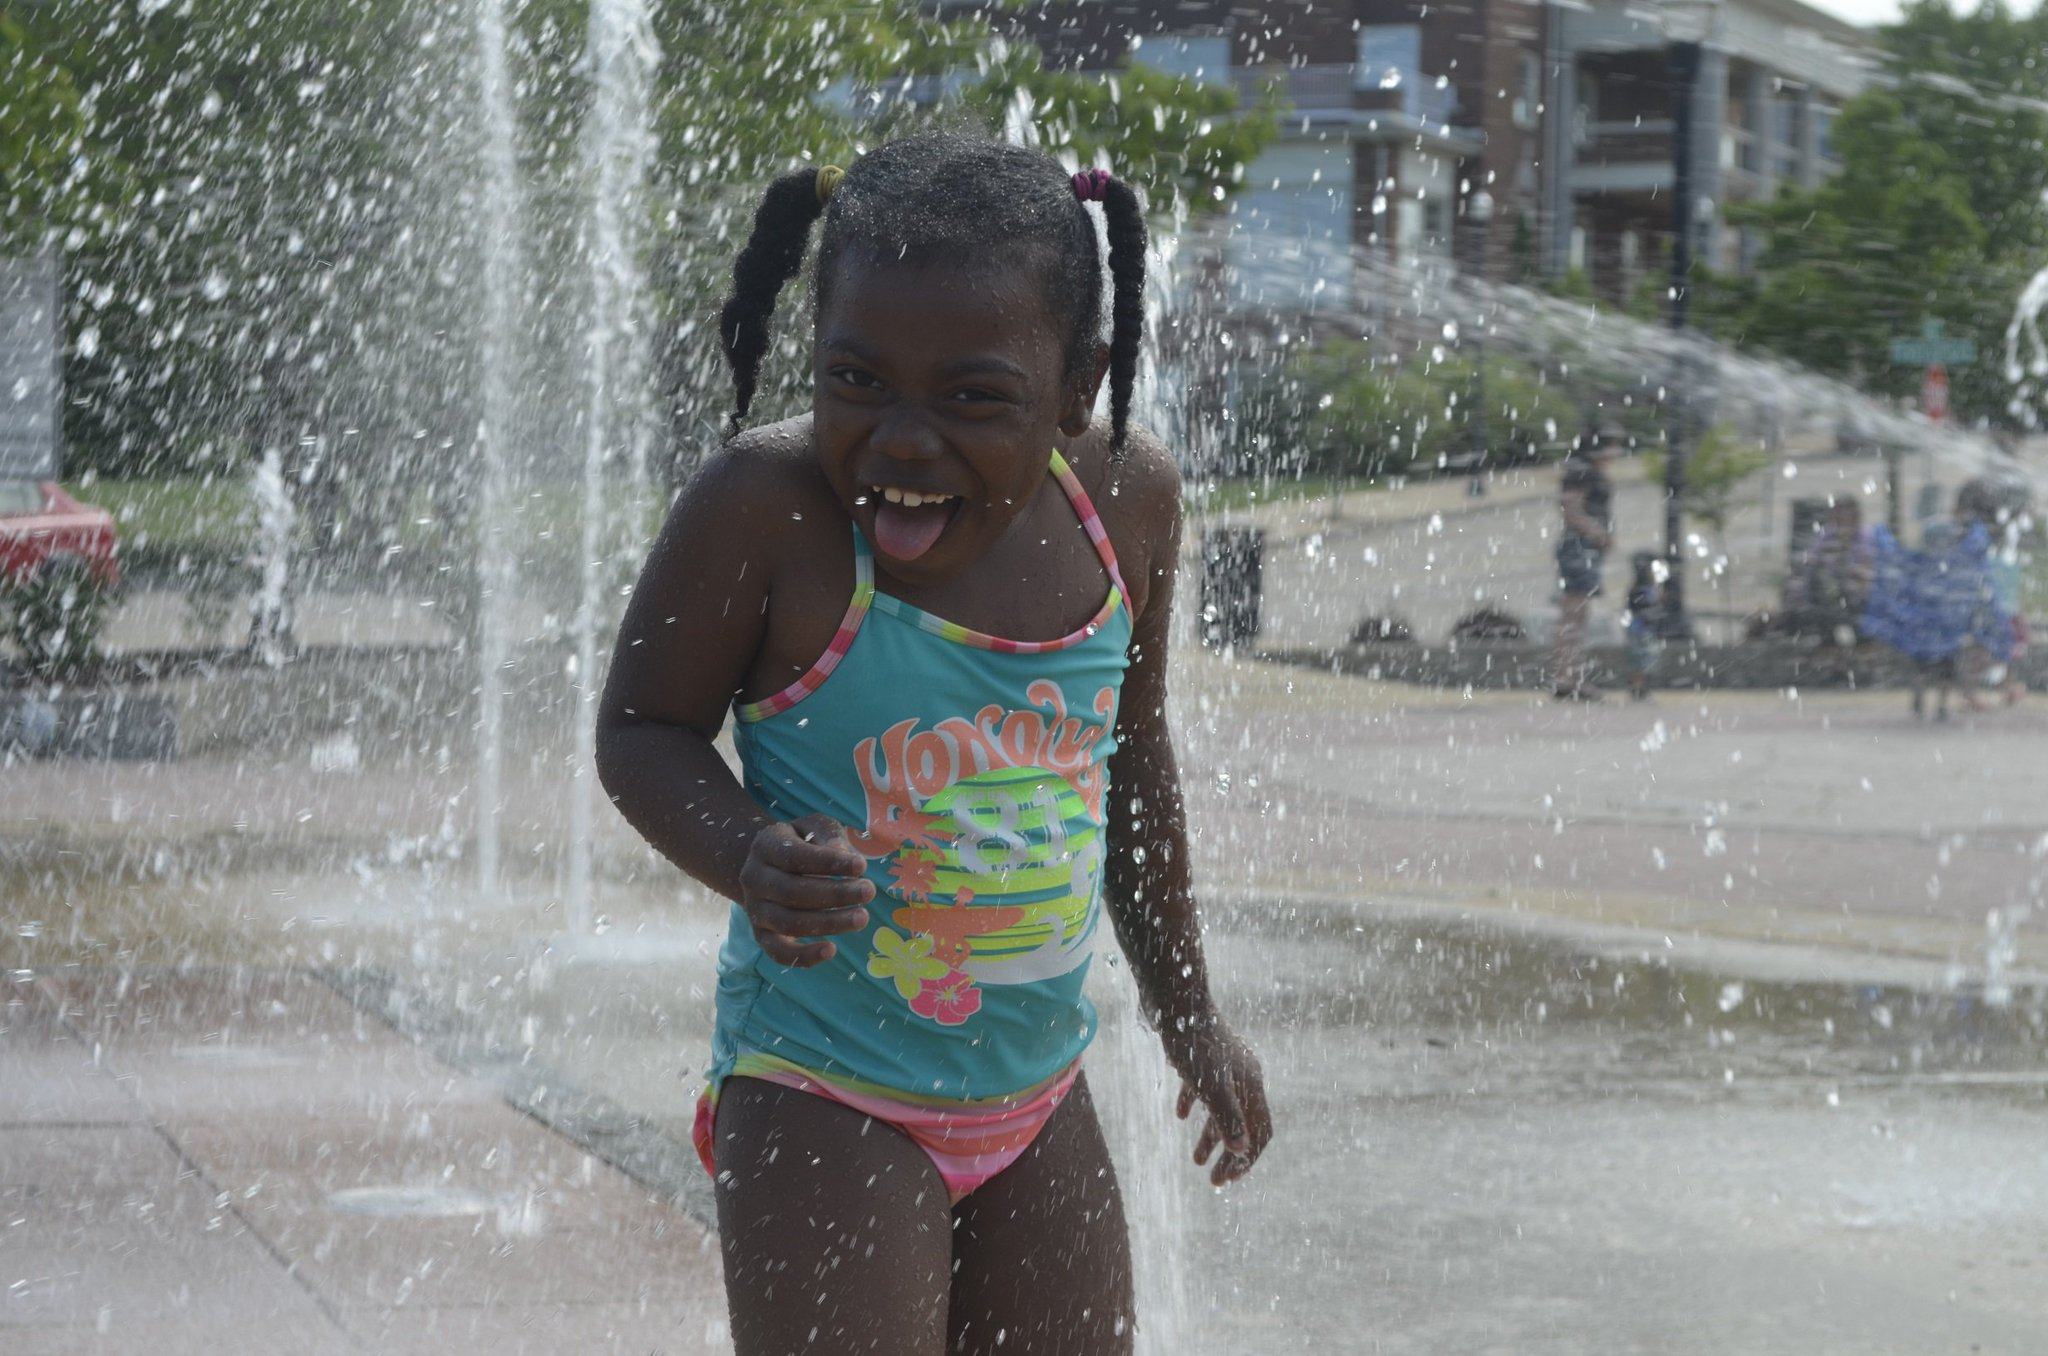 Enjoying water in the summer